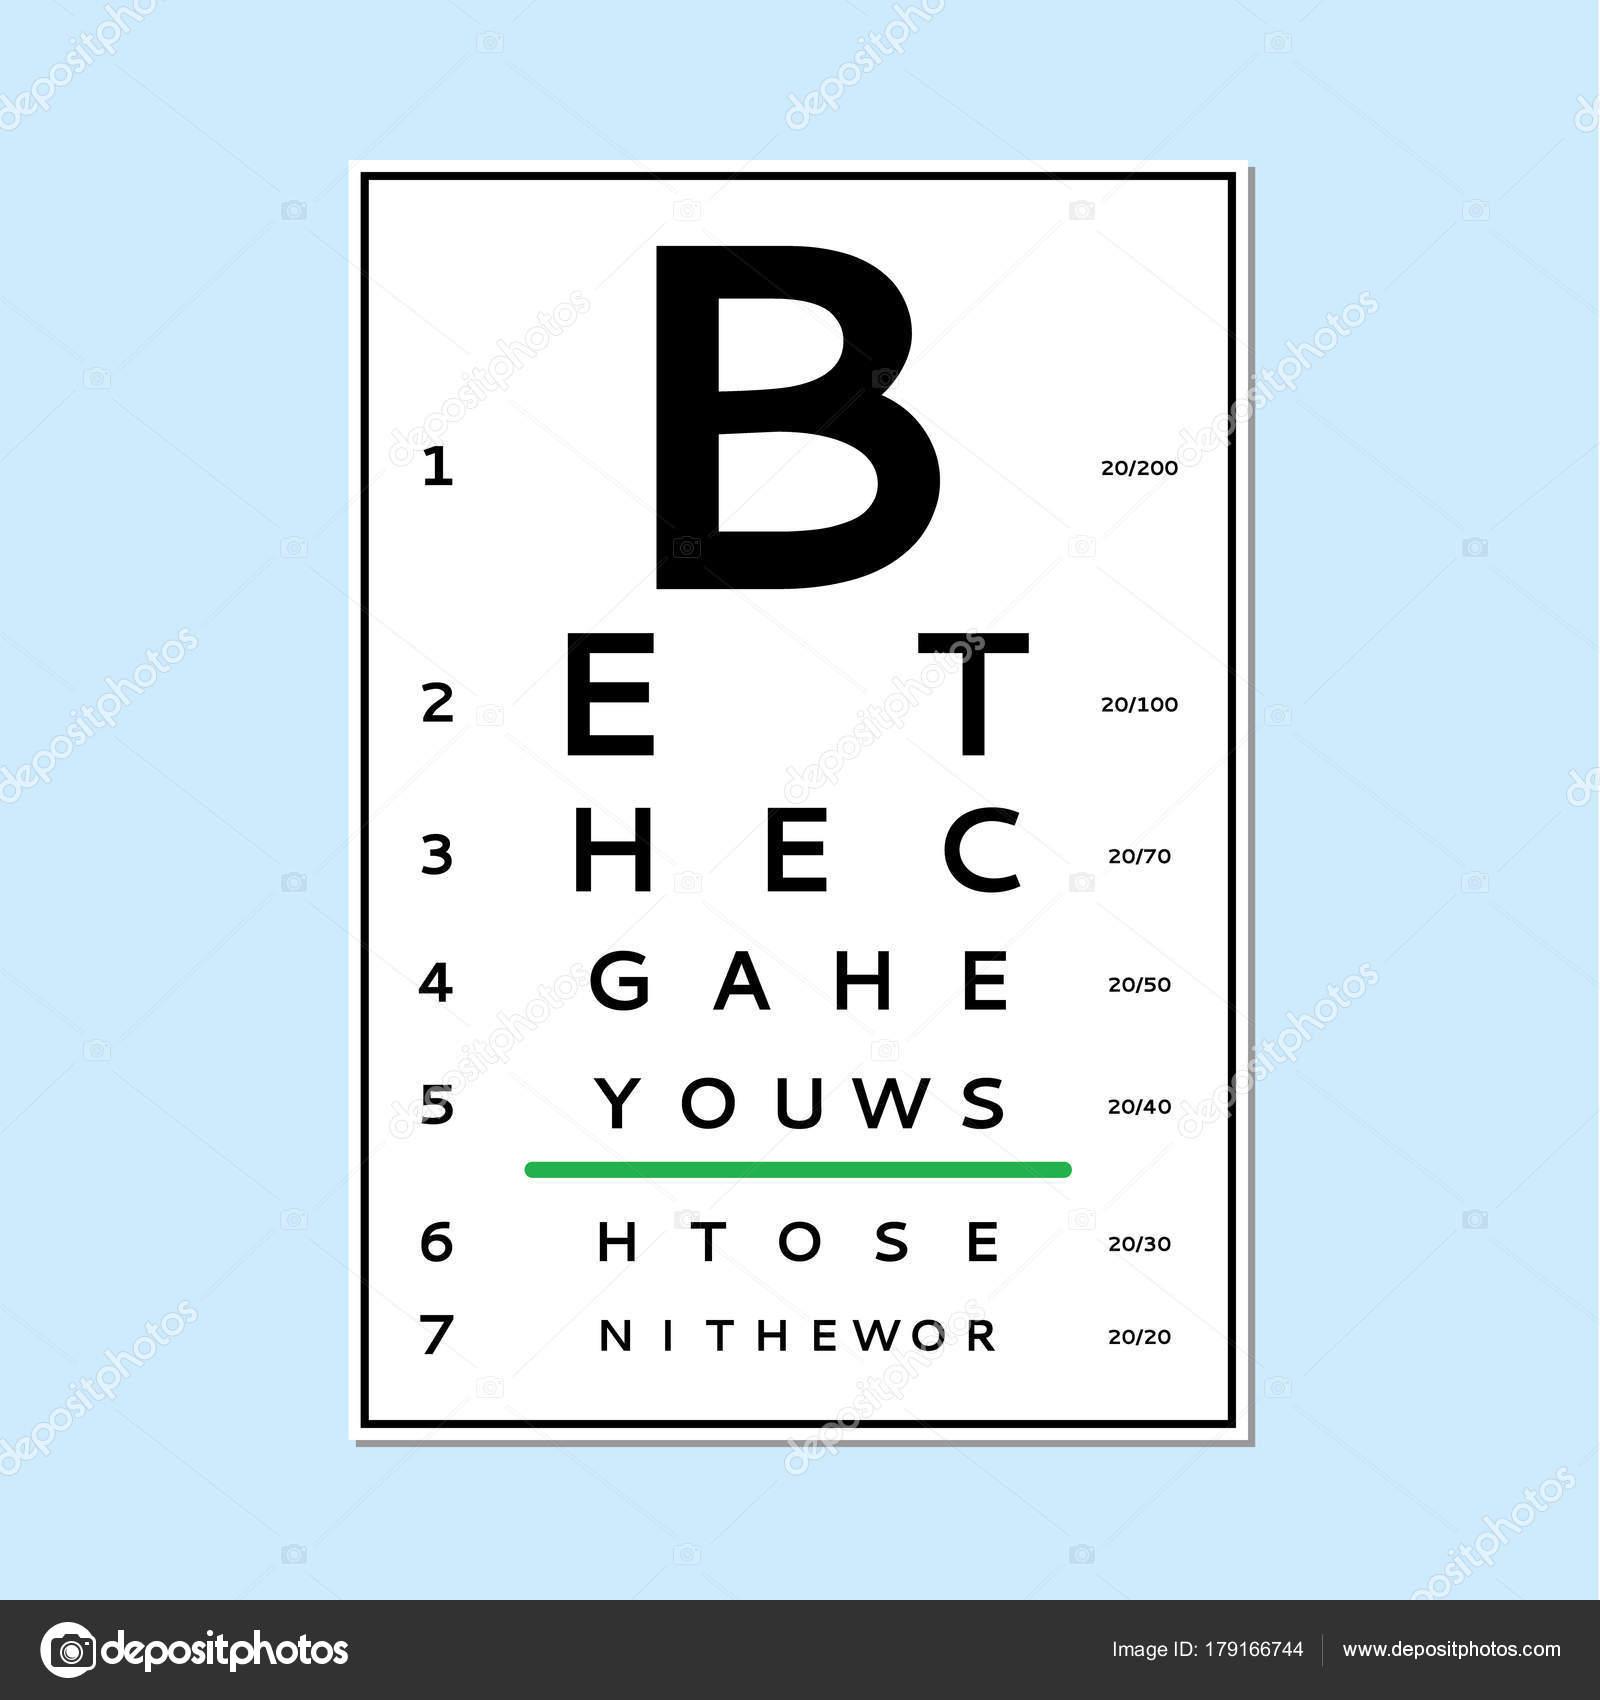 Eyes test chart stock vector olhayerofieieva 179166744 eyes test chart stock vector geenschuldenfo Image collections